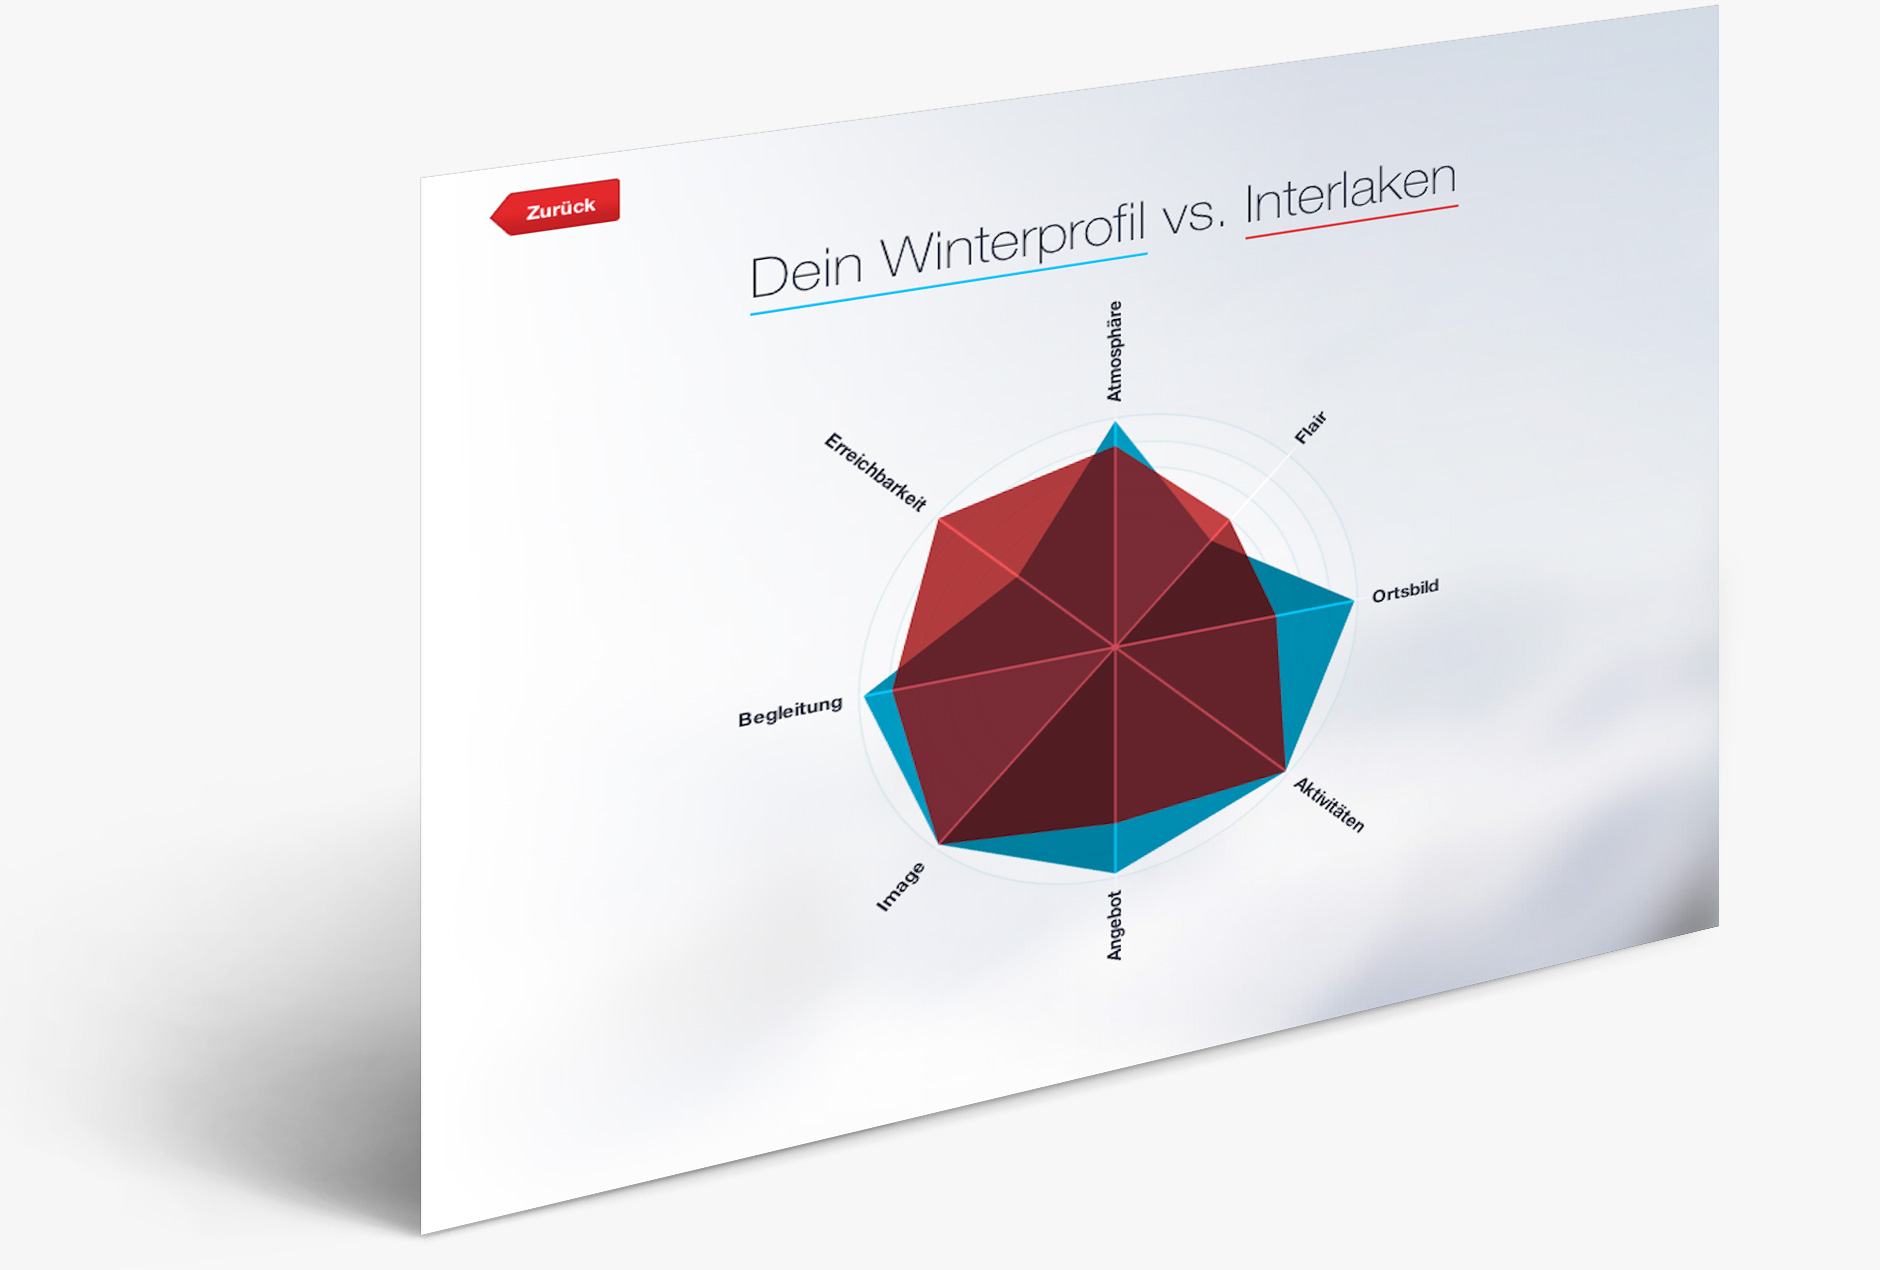 Interaktive Winterprofil